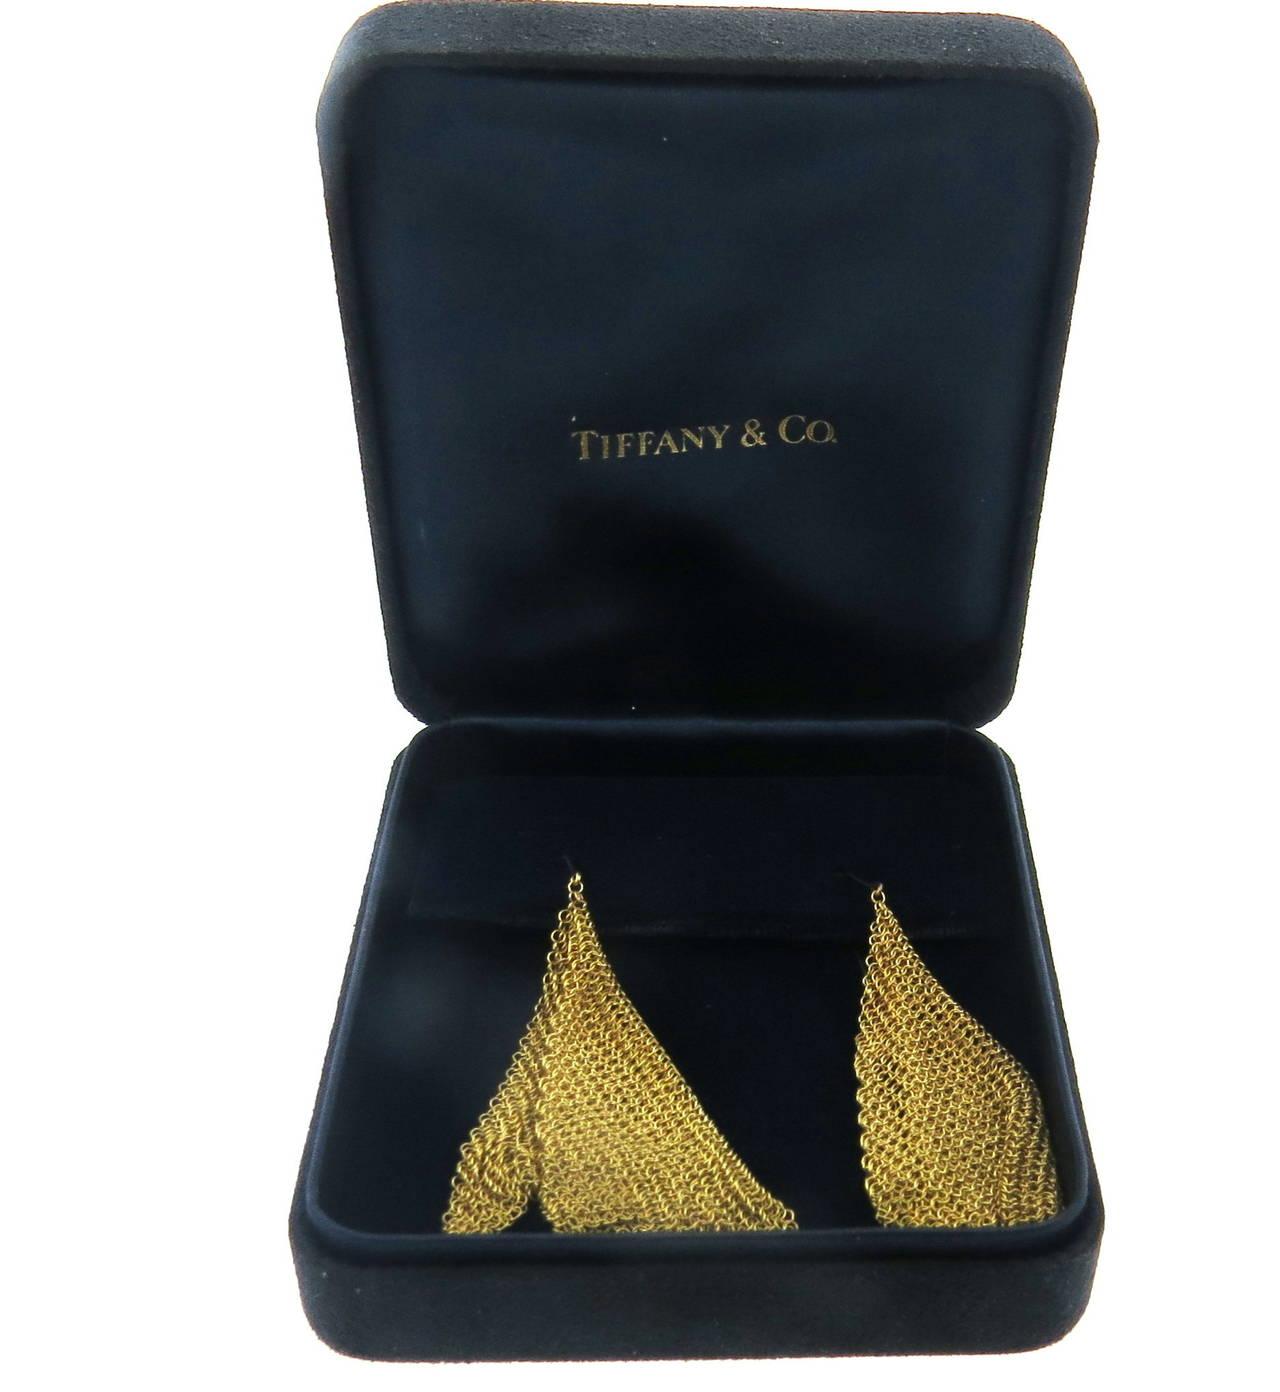 Tiffany & Co. Elsa Peretti Gold Mesh Scarf Long Earrings 3